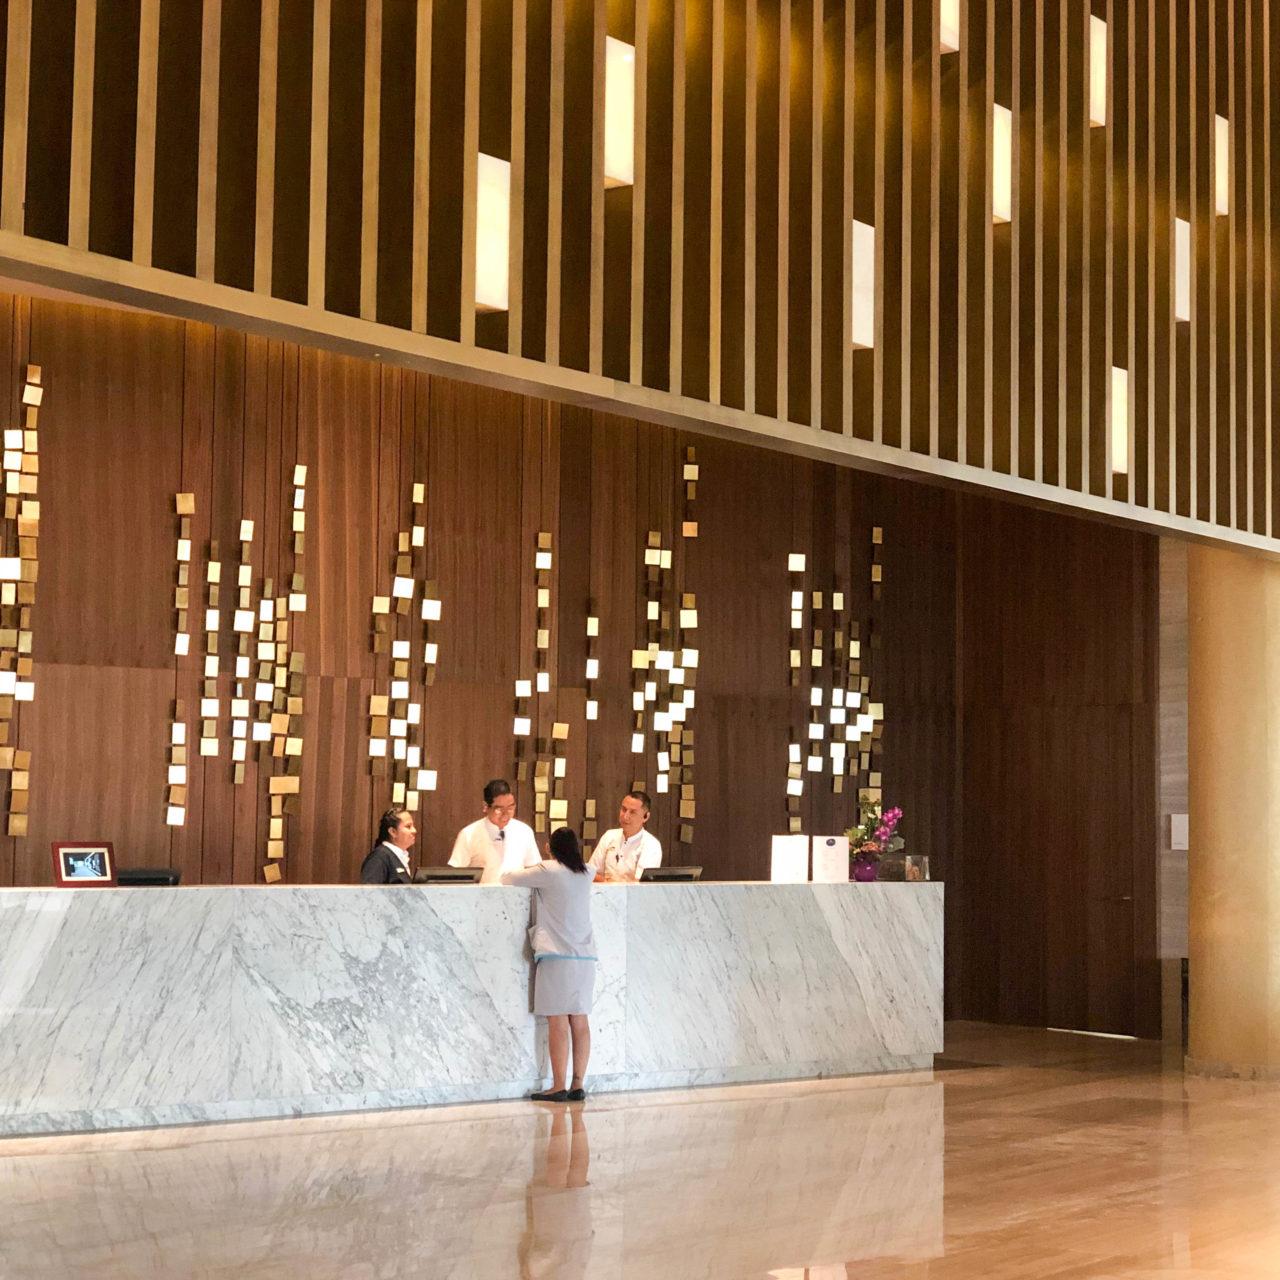 #HotelierDeco TRS Coral Hotel, lujo vanguardista con respeto a su entorno